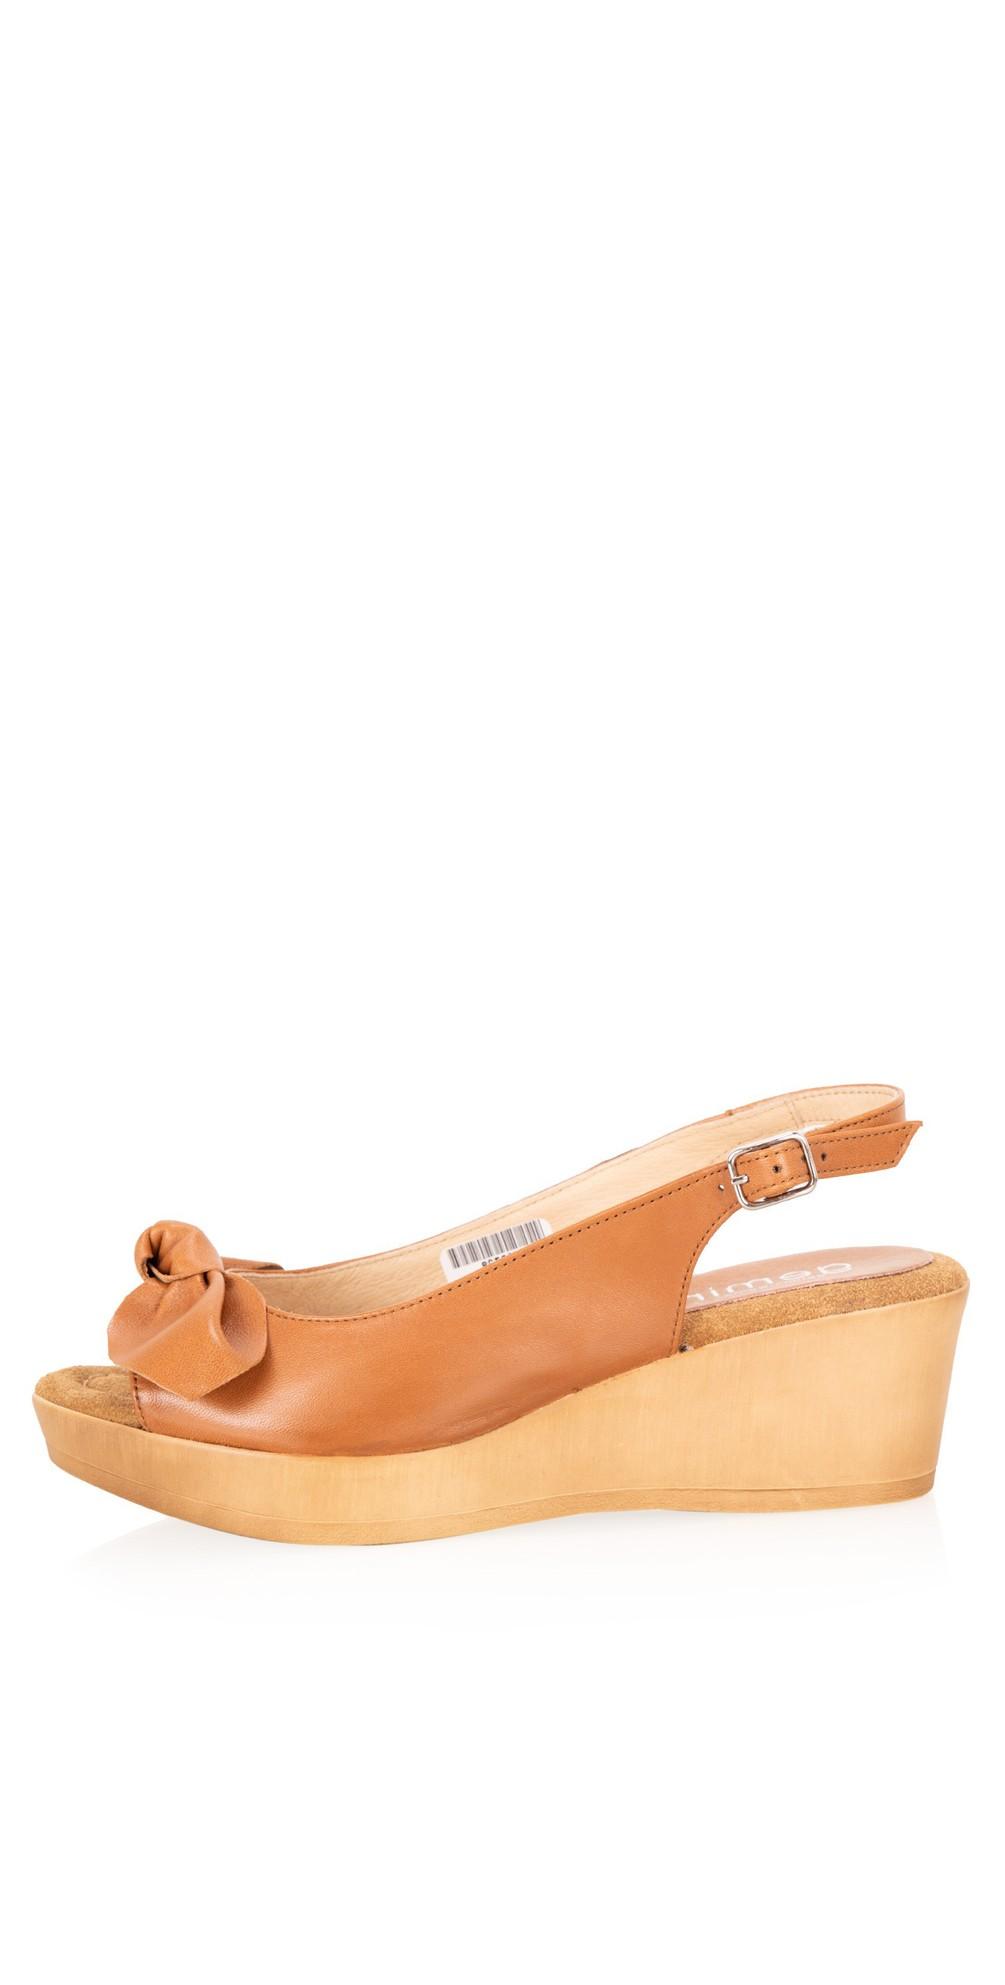 Bunny Leather Wedge Sandal main image